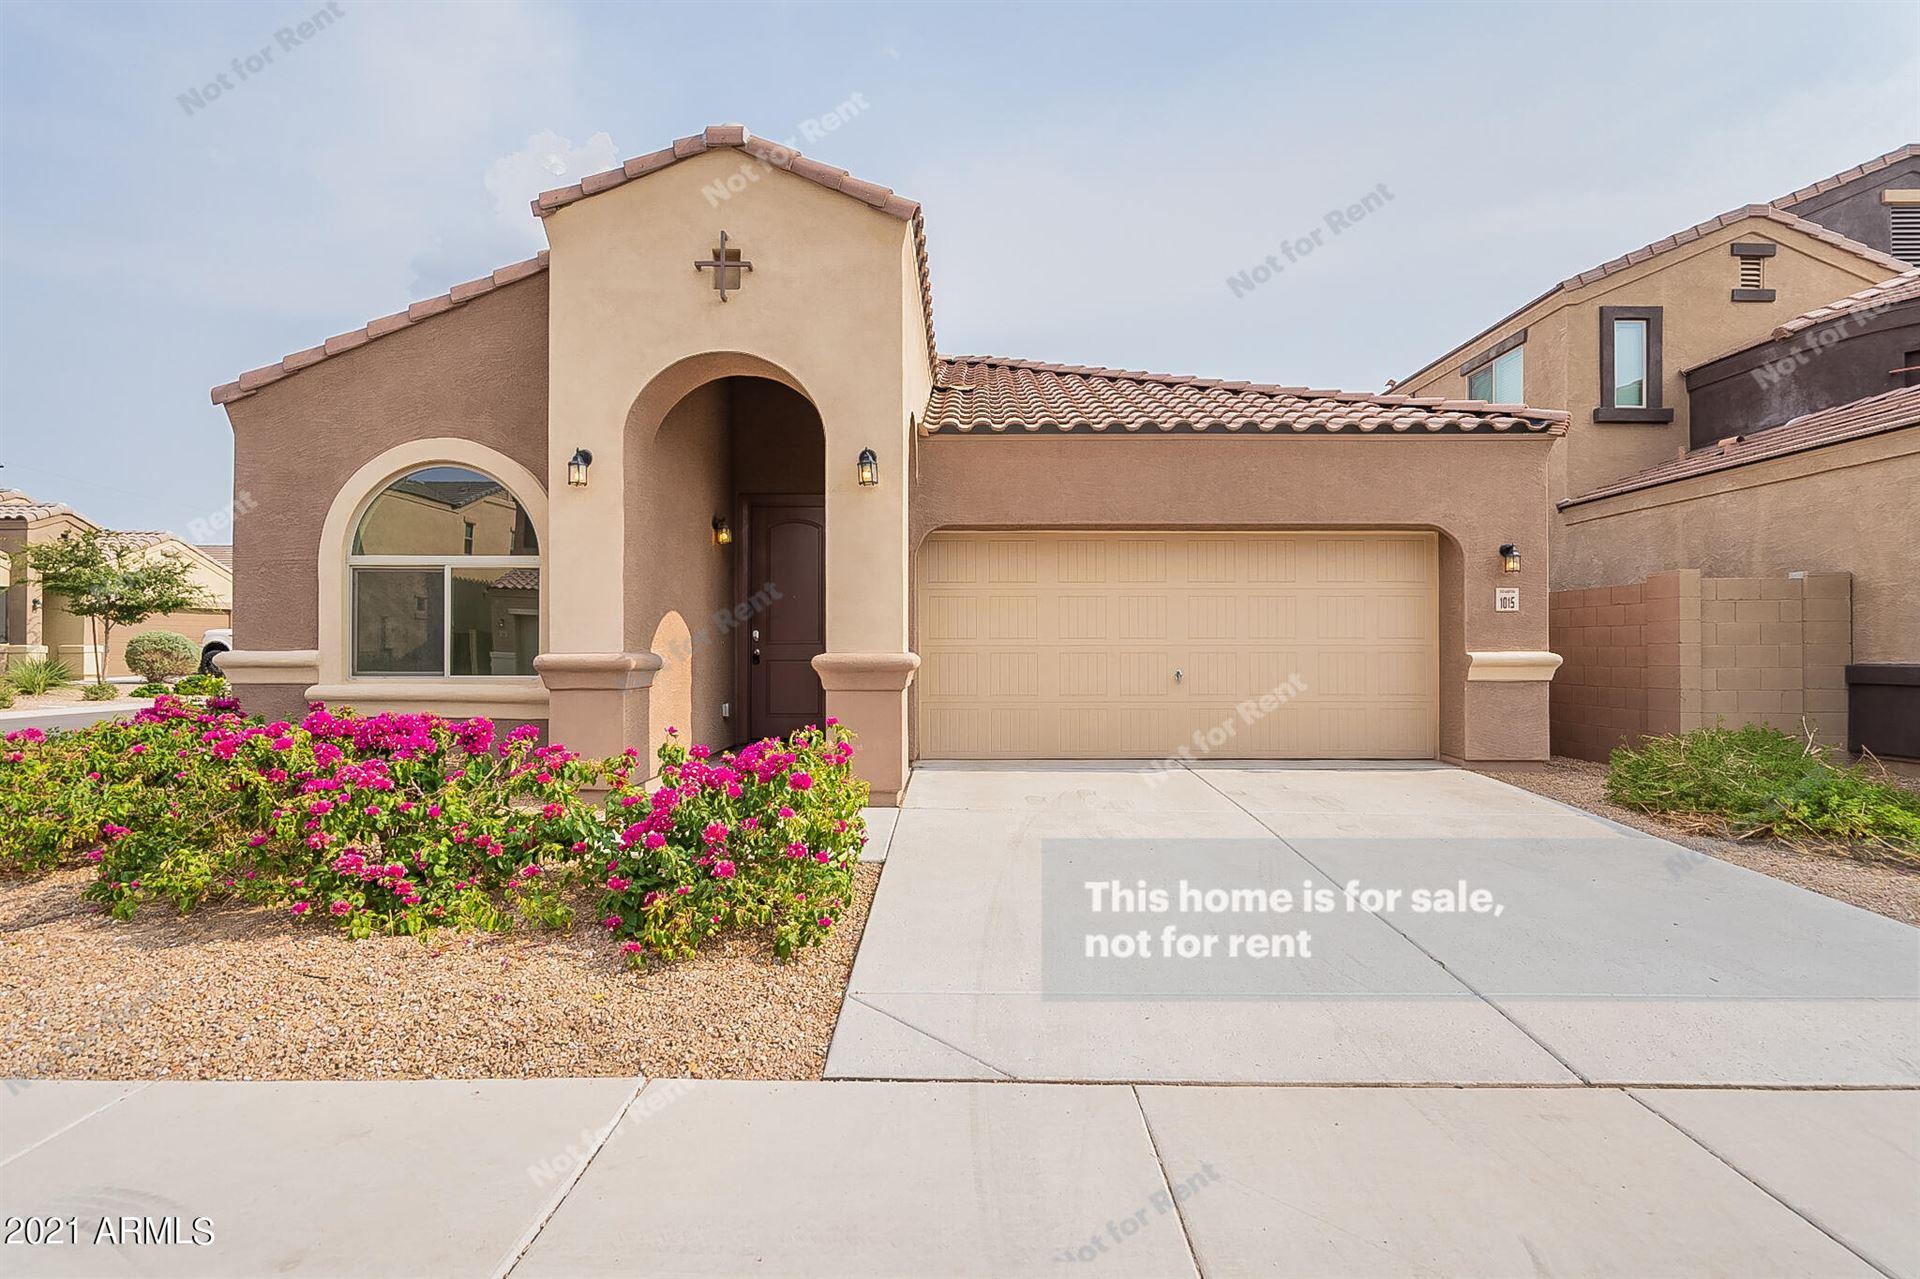 1015 W INDIGO Street, Mesa, AZ 85201 - MLS#: 6269019